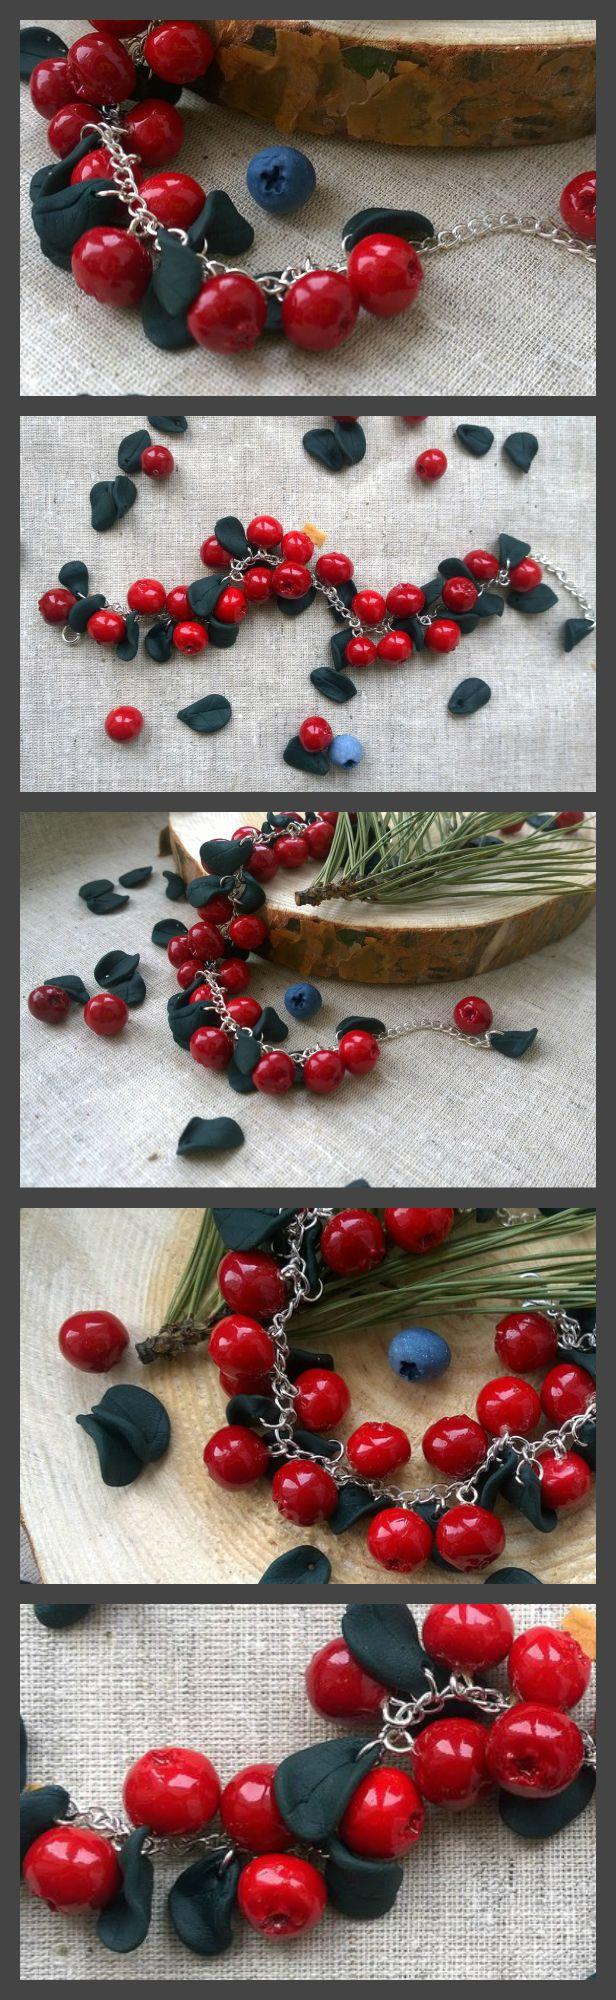 #red #bracelet #berries #berry #cranberry #polymerclay #fimo #sculpey #miniature #art #pine #wood #follow #handmade #craft #etsy #etsyhandmade #instahandmade #forest #fashion #jewelry #summer #earrings